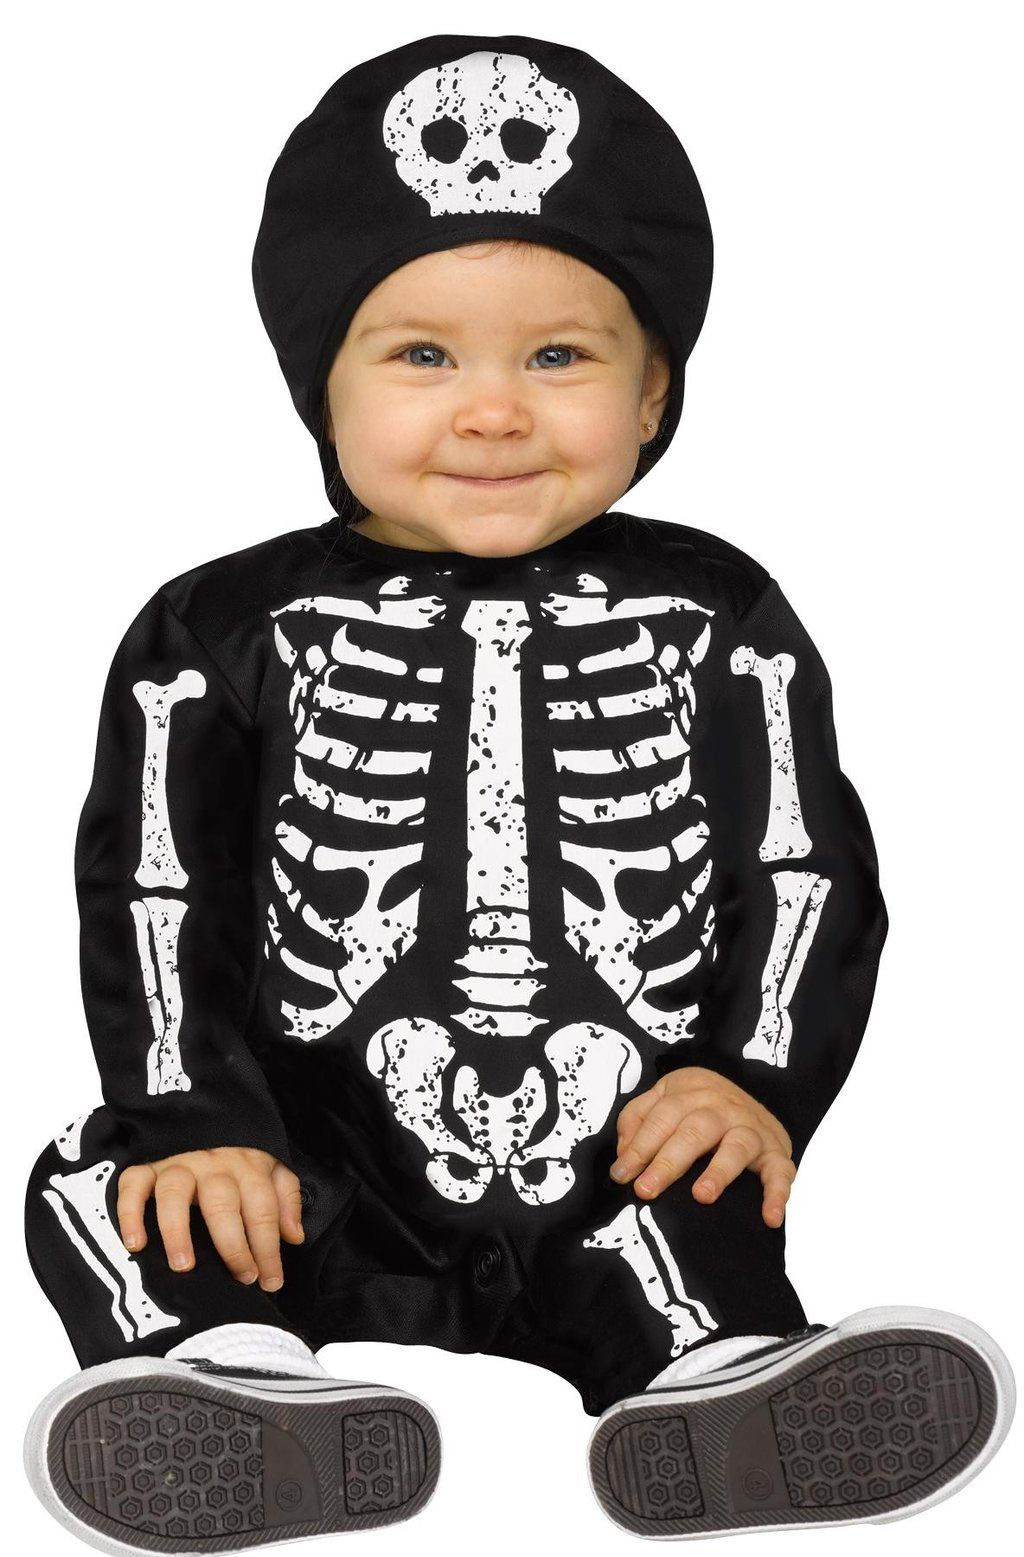 baby bones wt ch 6-12m | newborn halloween costumes, newborn